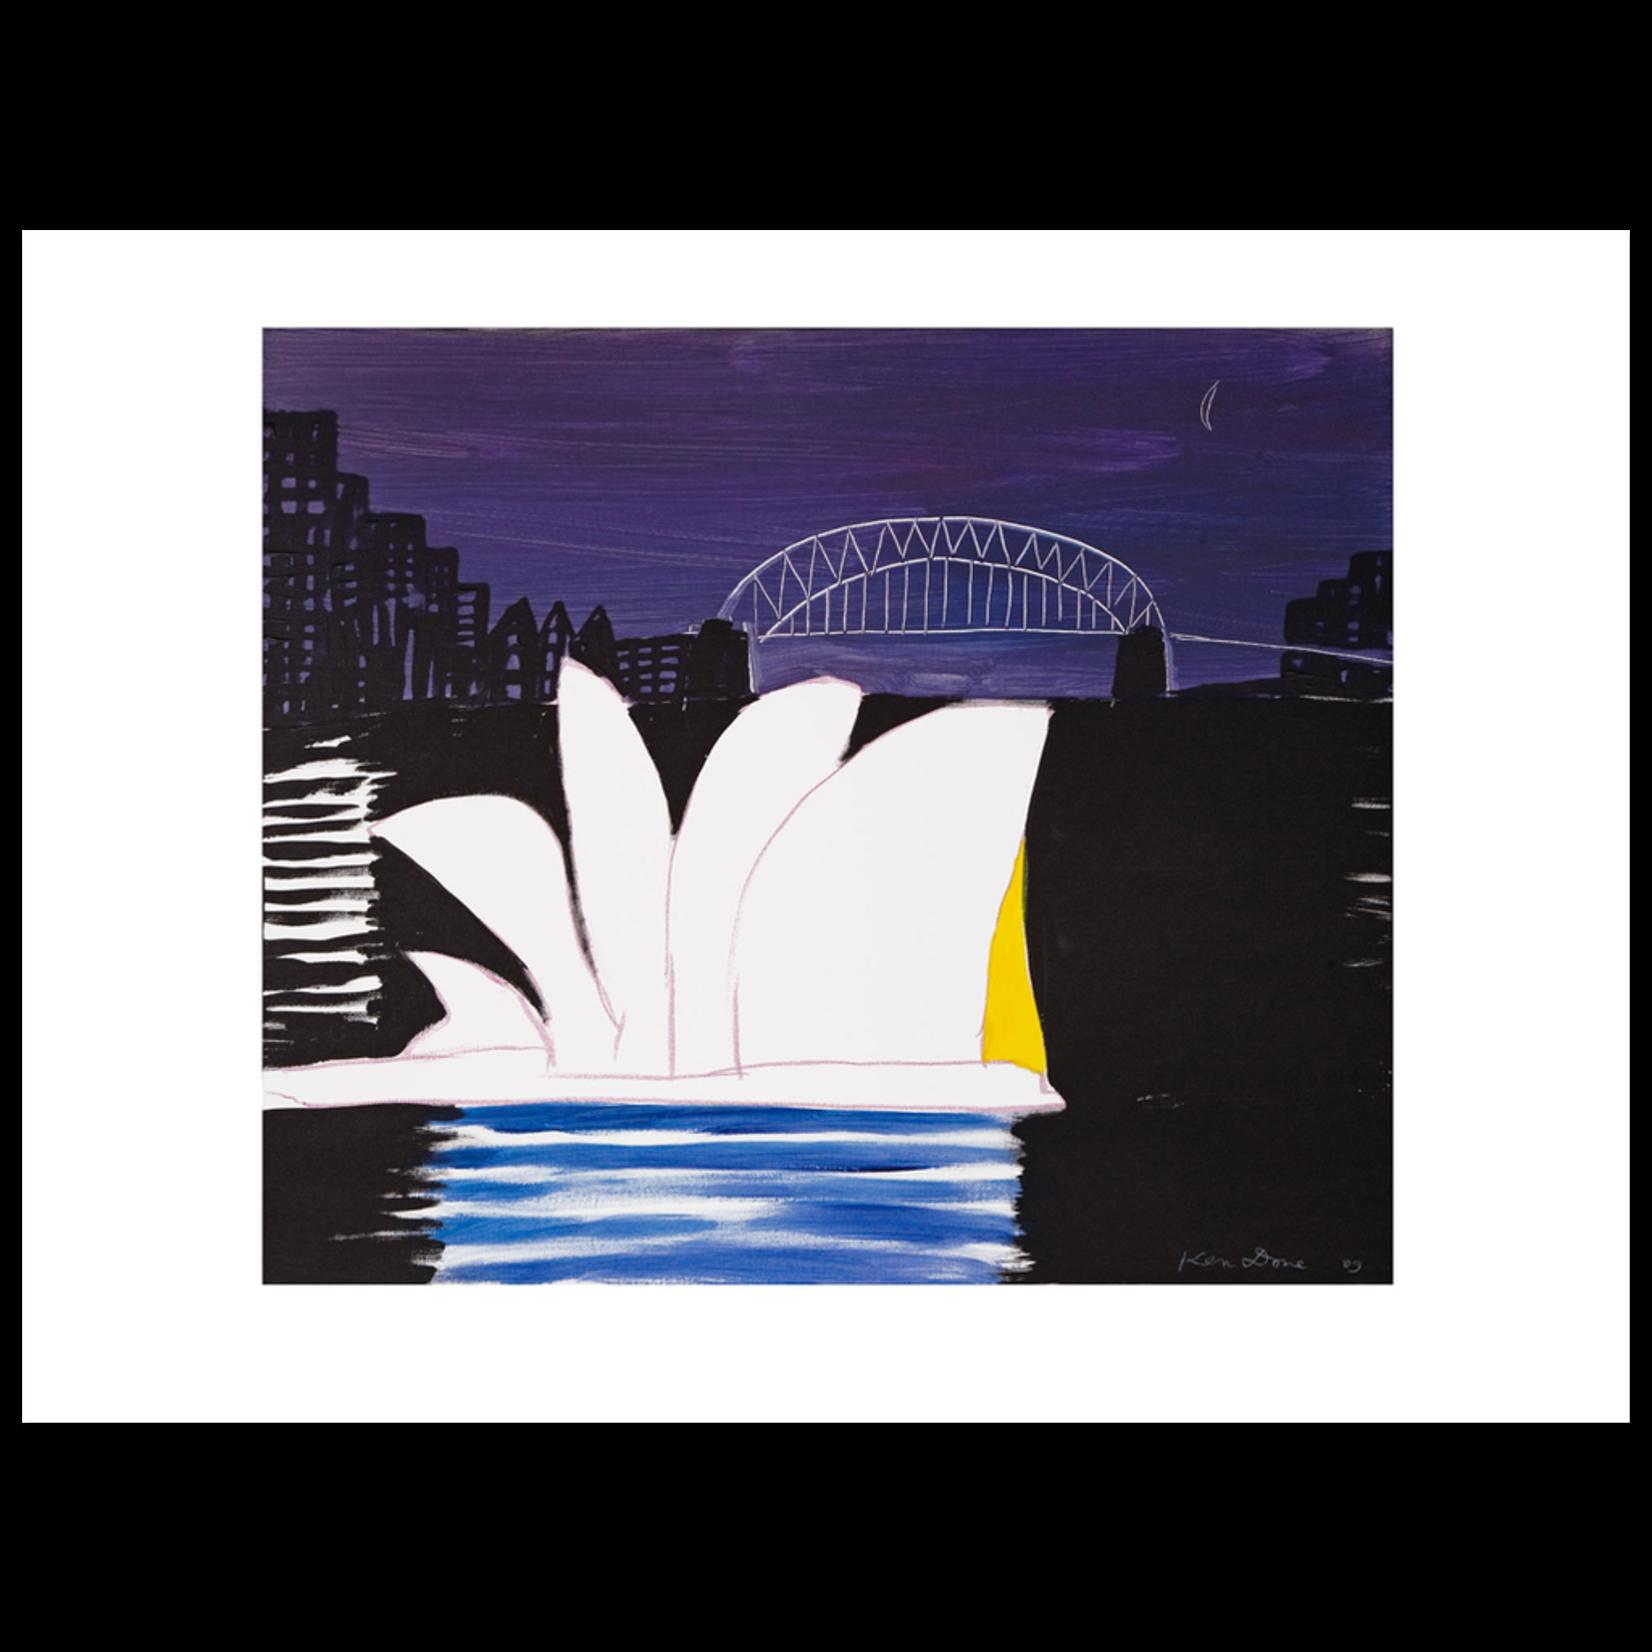 Limited Edition Prints Opera House, black sea, night sky, 2009